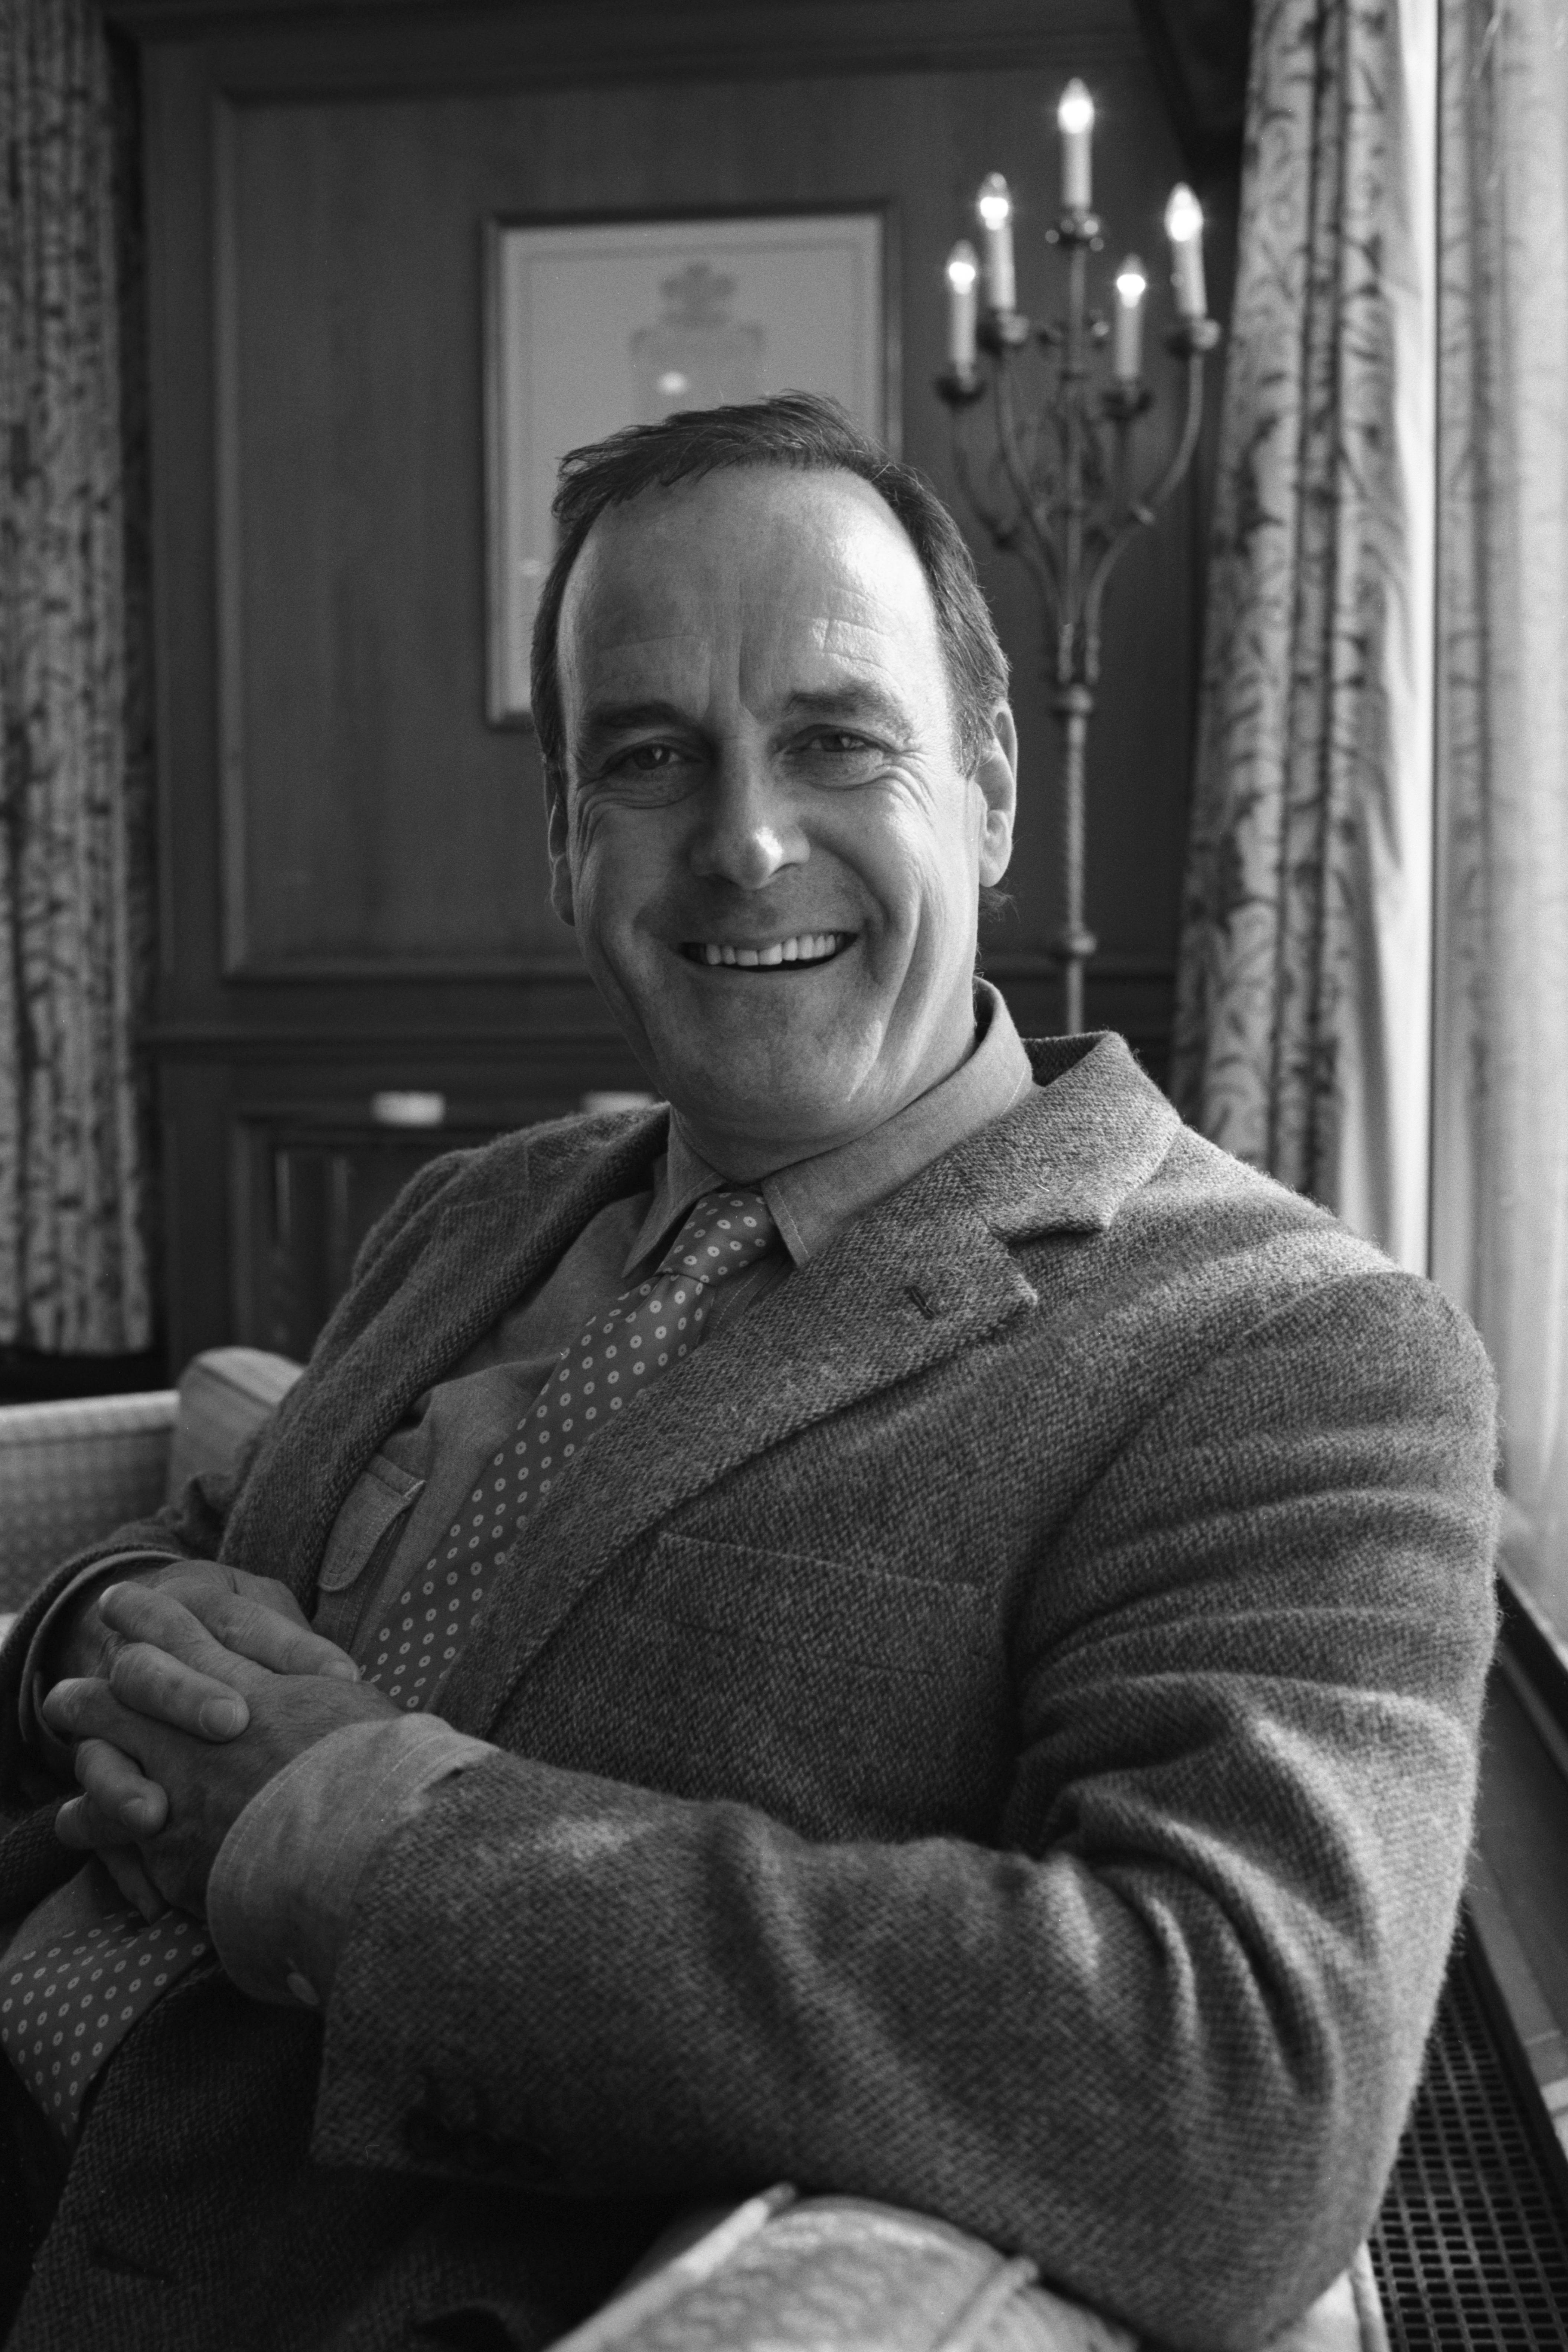 Portrait of former Monty Python actor John Cleese on October 07, 1988.